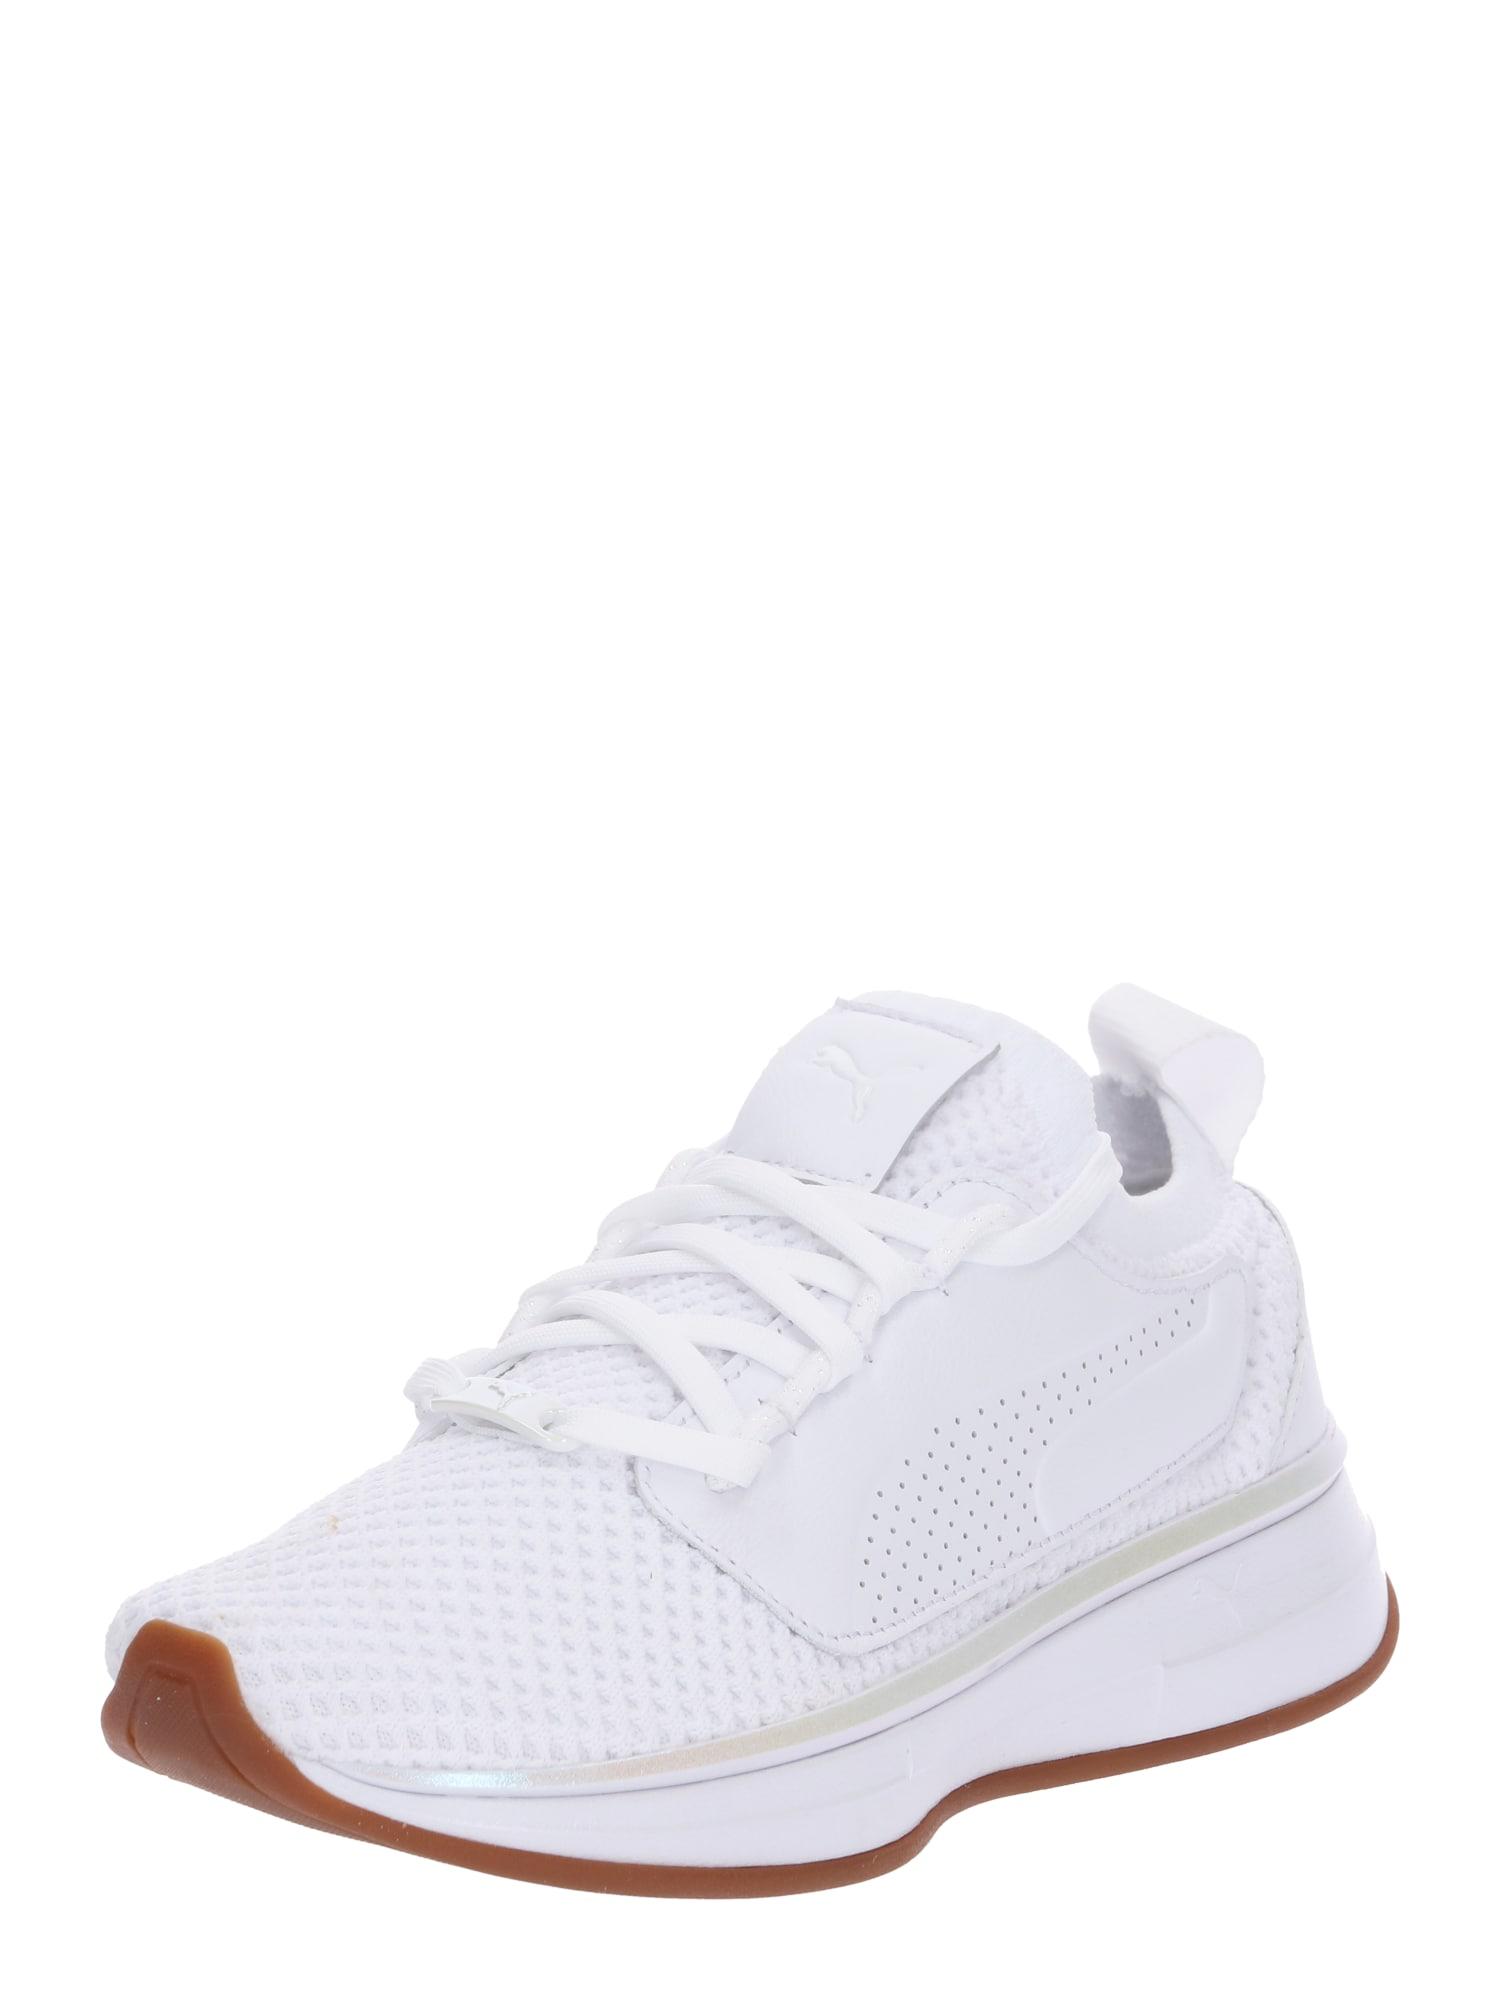 Sportovní boty SG Runner bílá PUMA